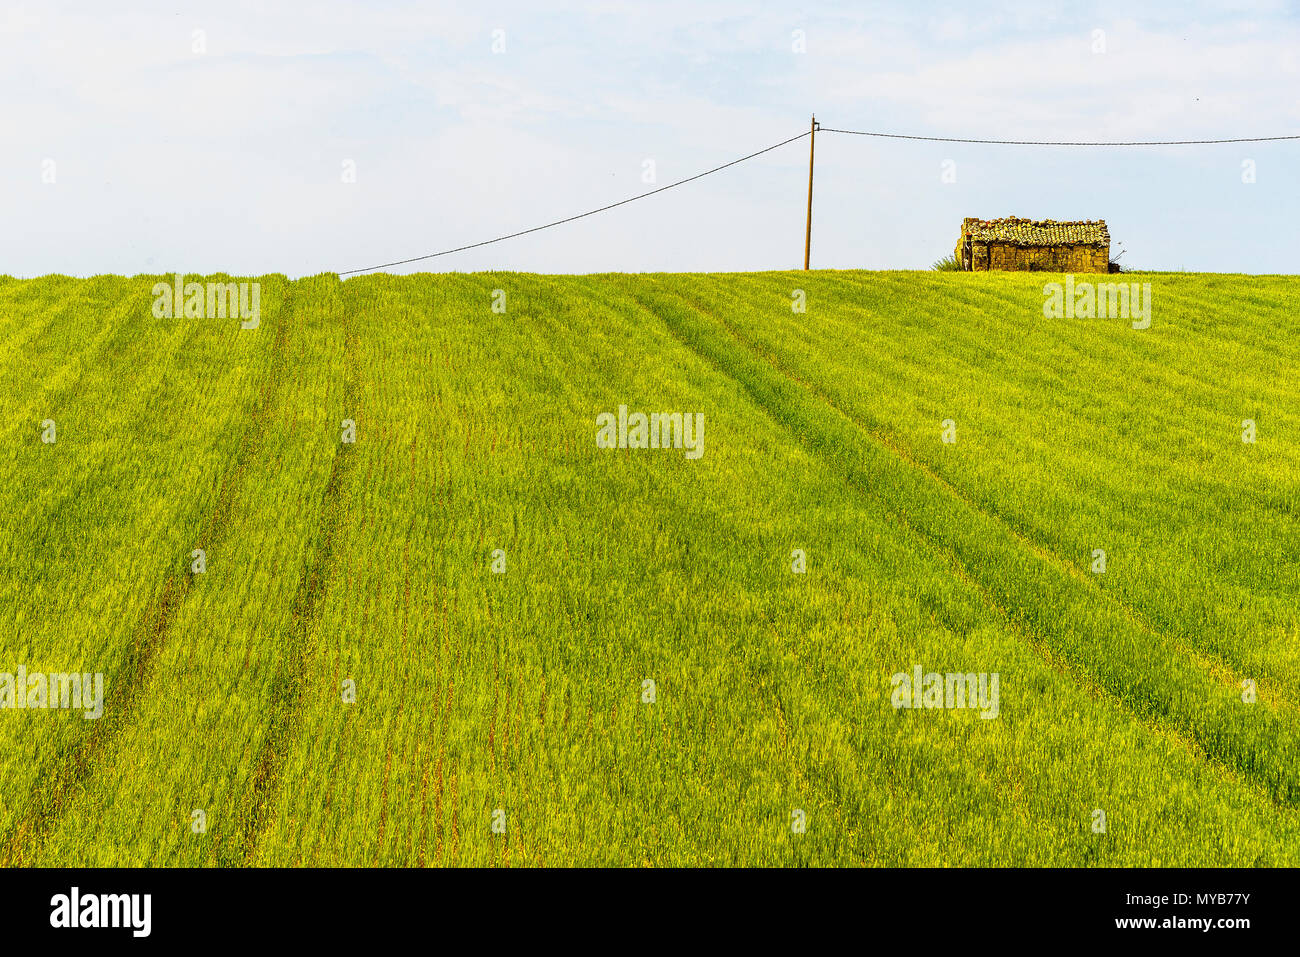 Basilicata countryside sceneries during the spring season - Stock Image